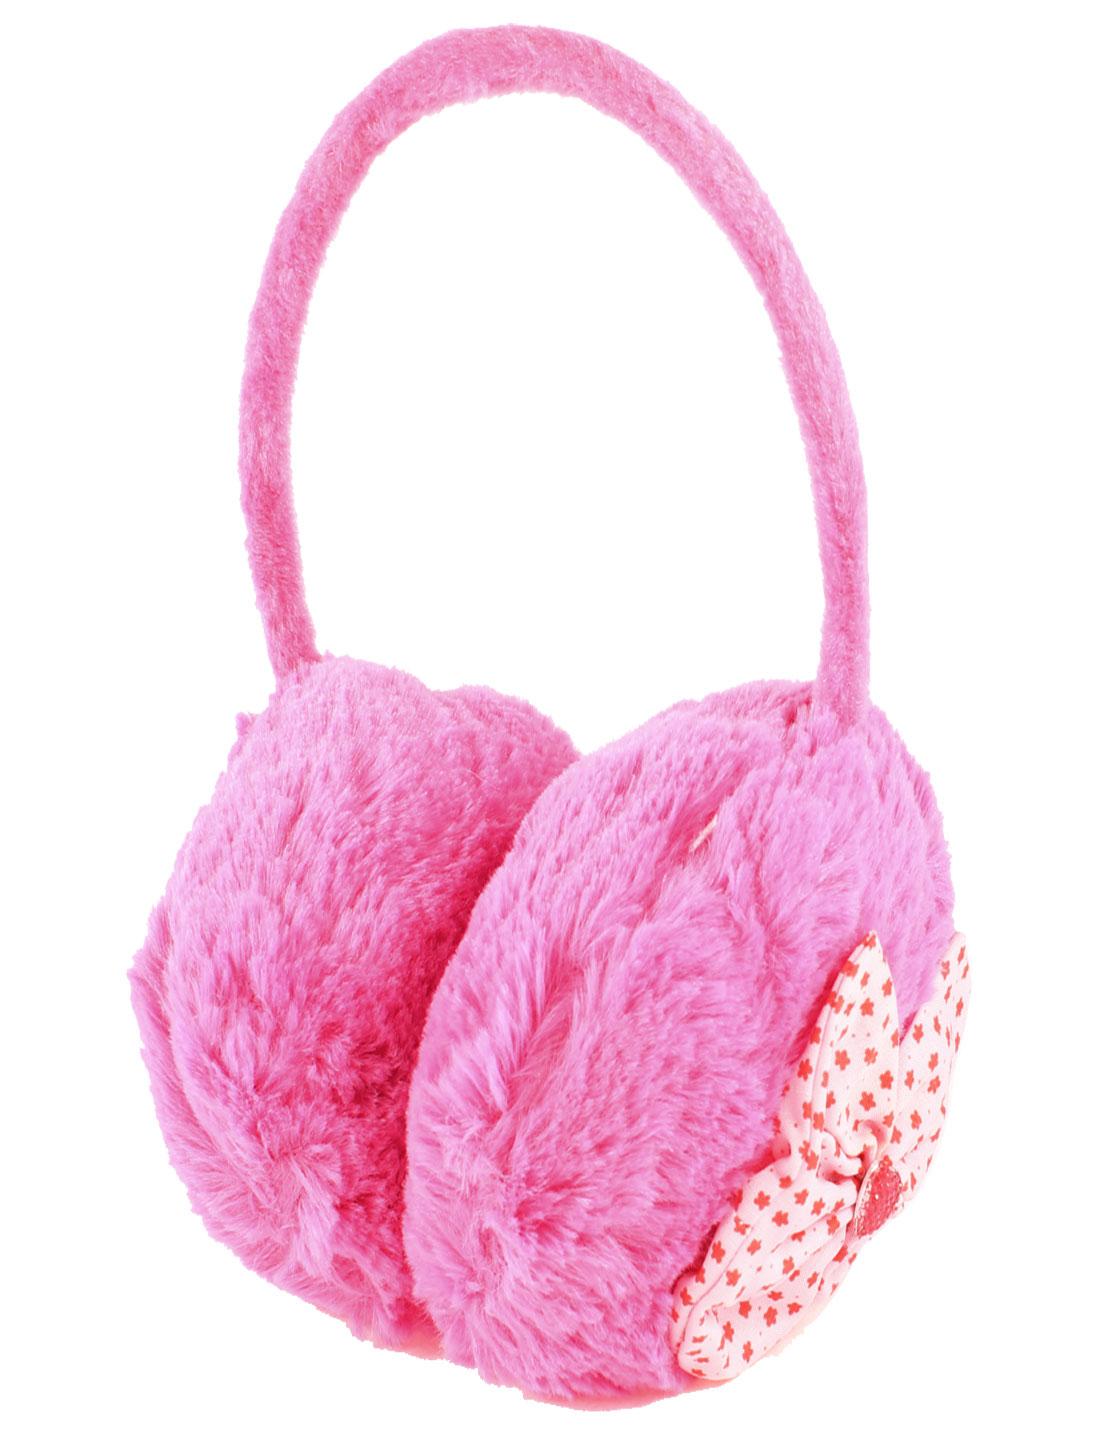 Girls Plastic Frame Hot Pink Plush Ear Warmer Winter Earmuffs